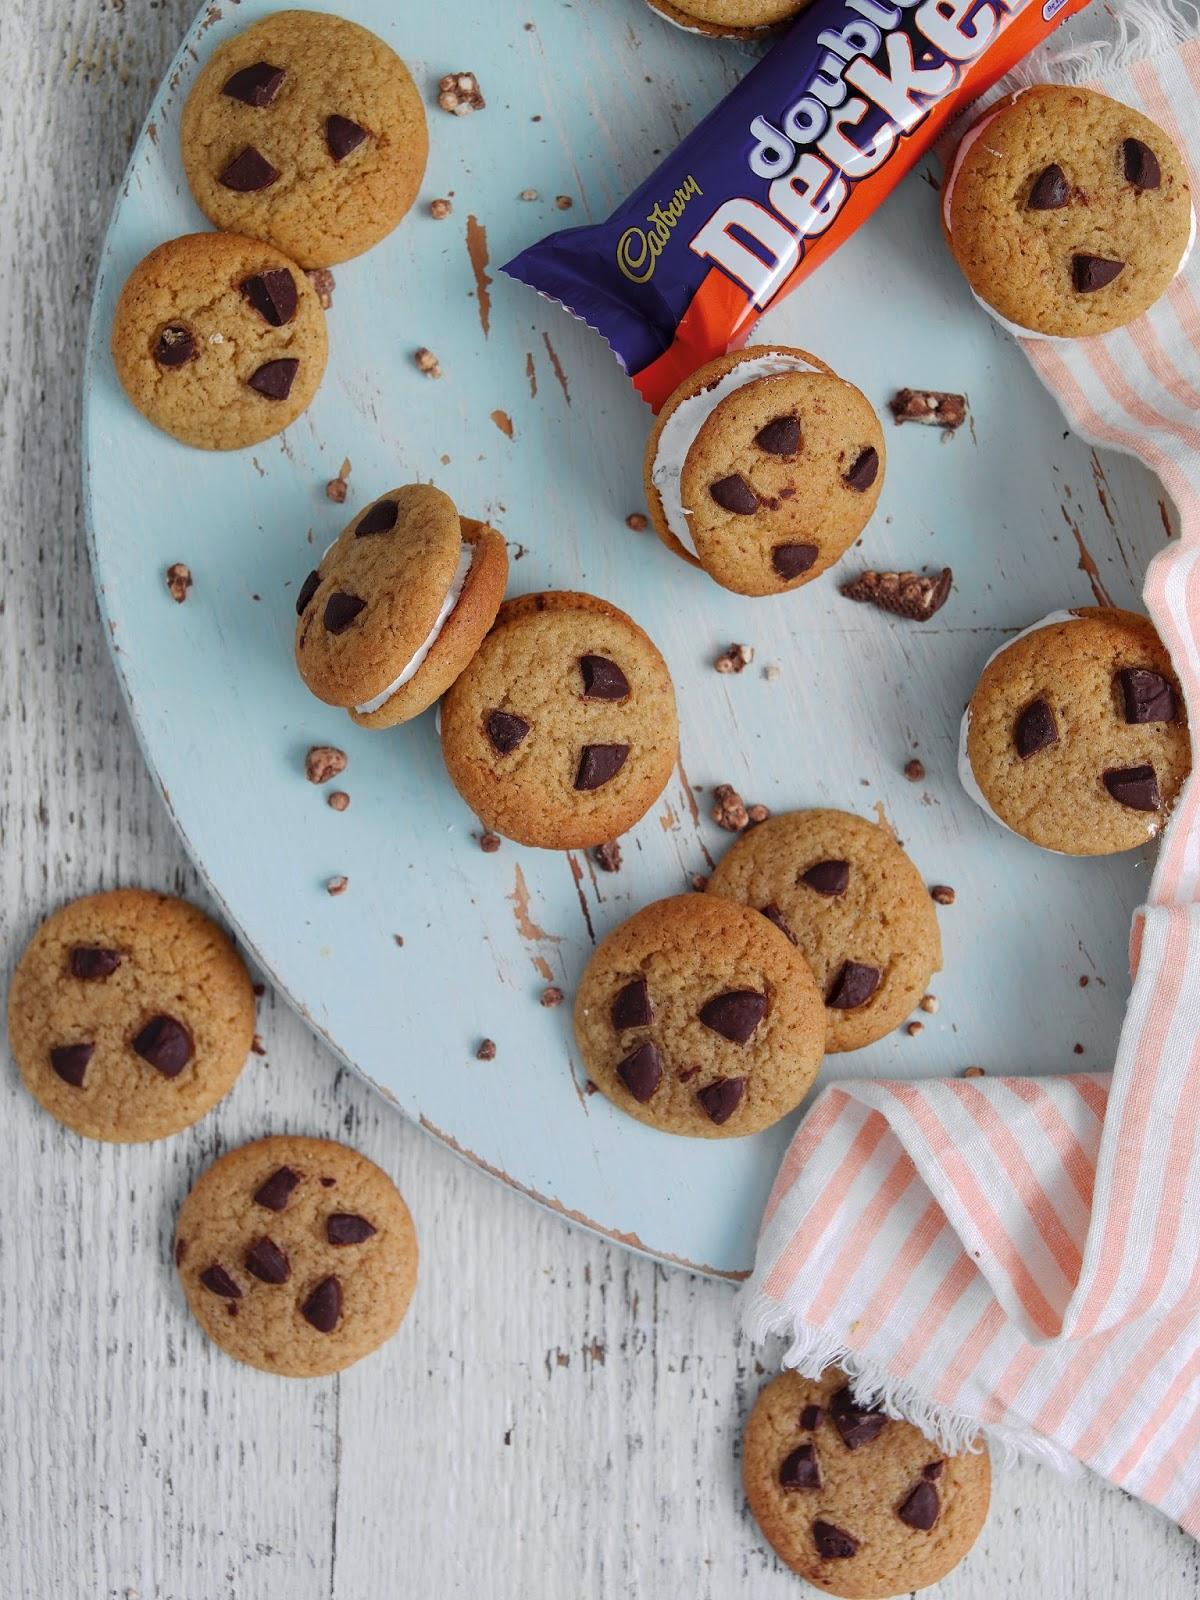 Double Decker Cookie Sandwiches